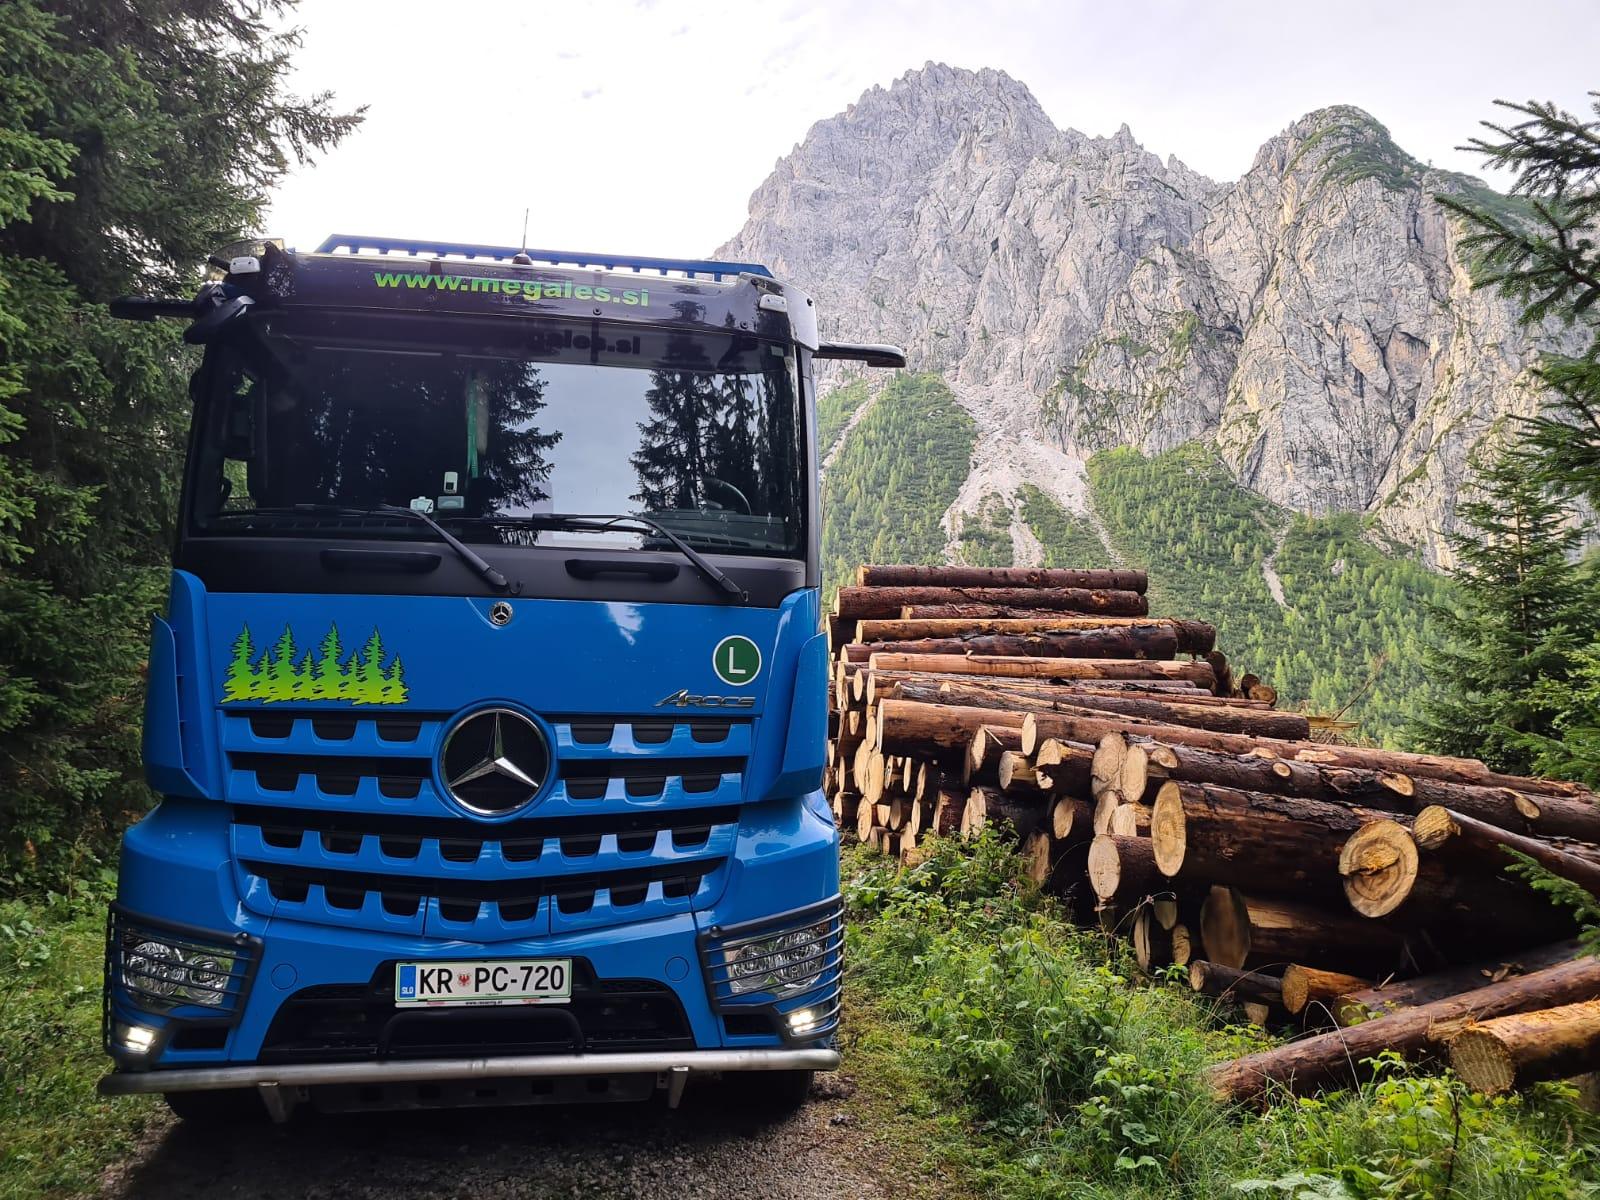 odkup lesa na kamionski cesti Megales